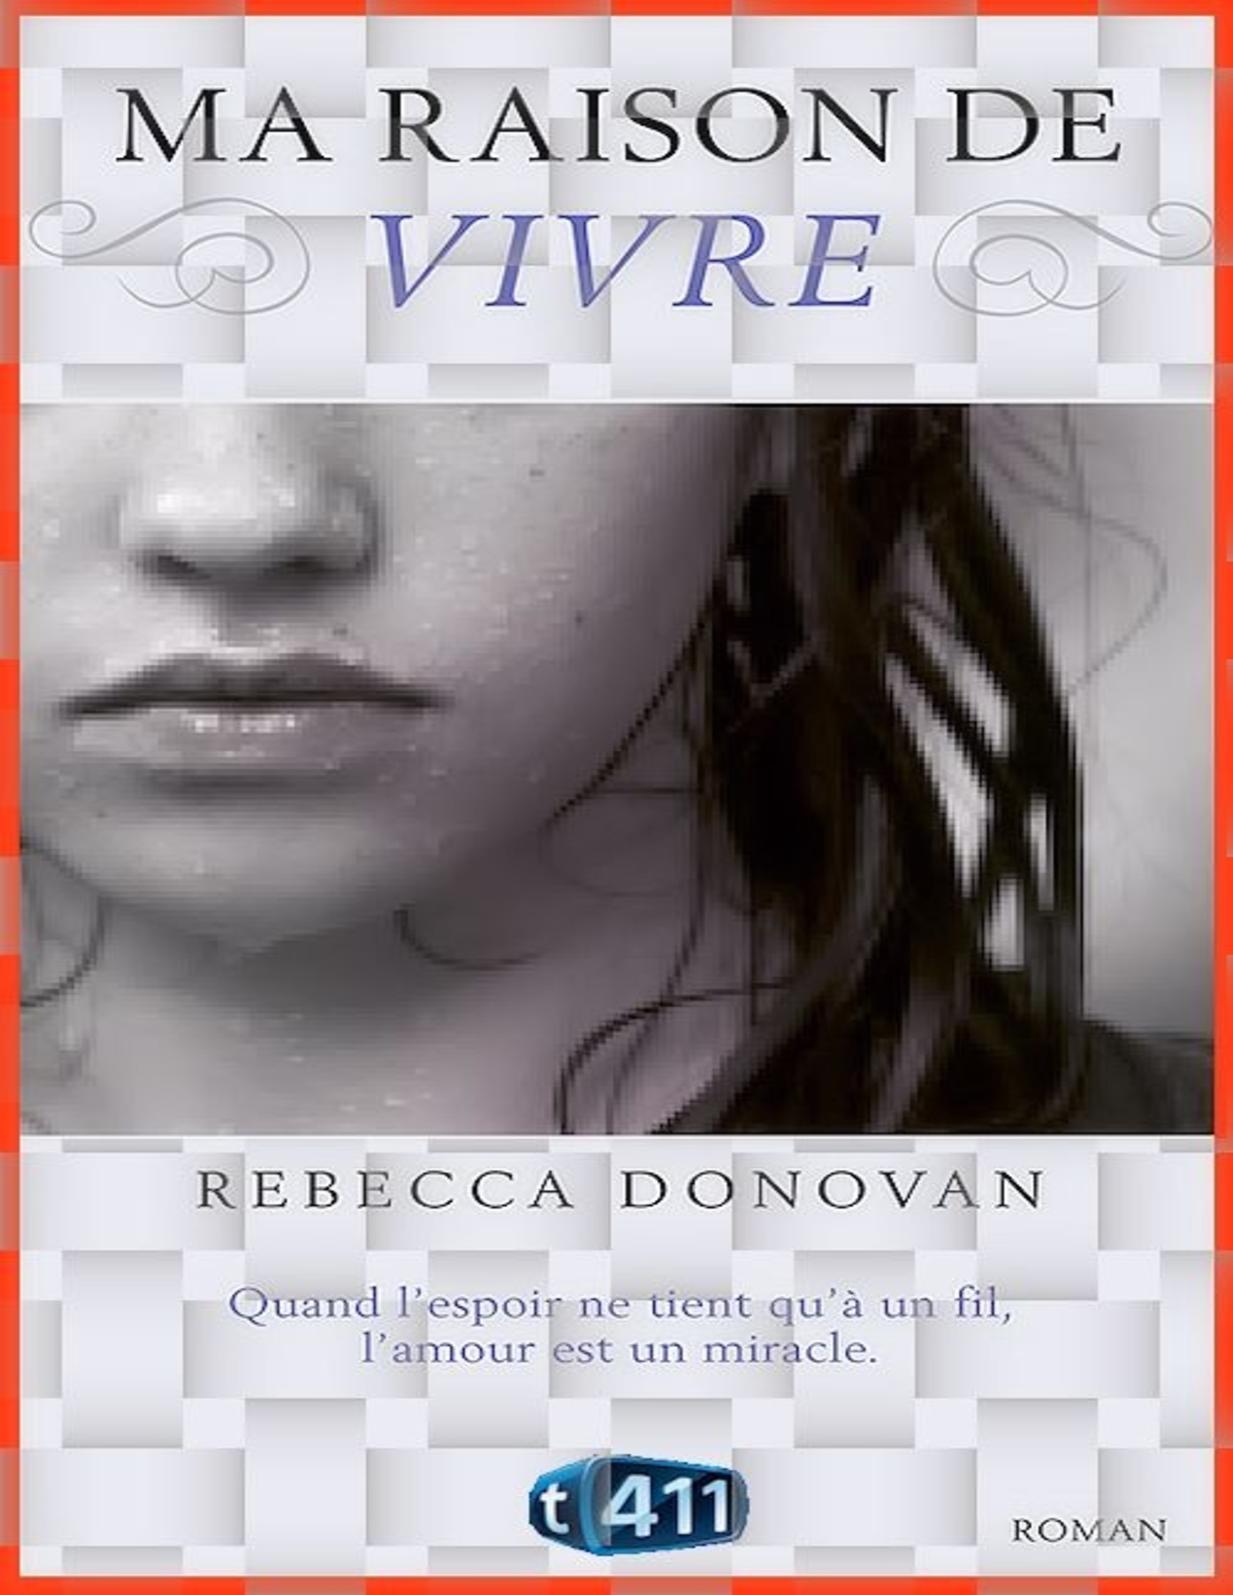 7f0ddbe59a07 Calaméo - Rebecca Donovan Ma Raison De Vivre Ebook Gratuit